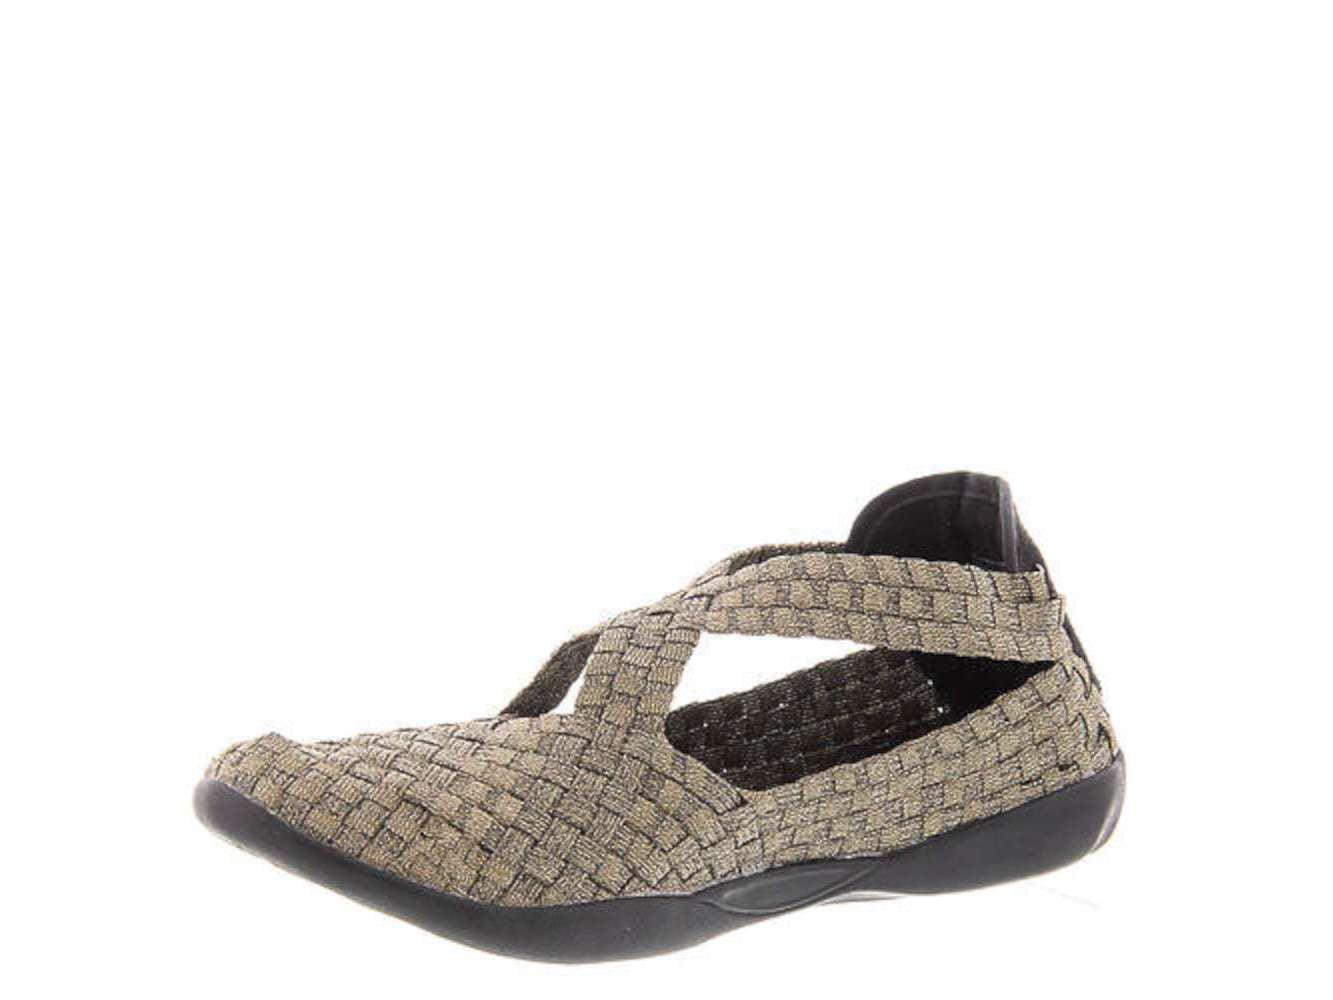 6f24b1e2aad Bernie Mev Womens Leero Closed Toe Casual Strappy Sandals